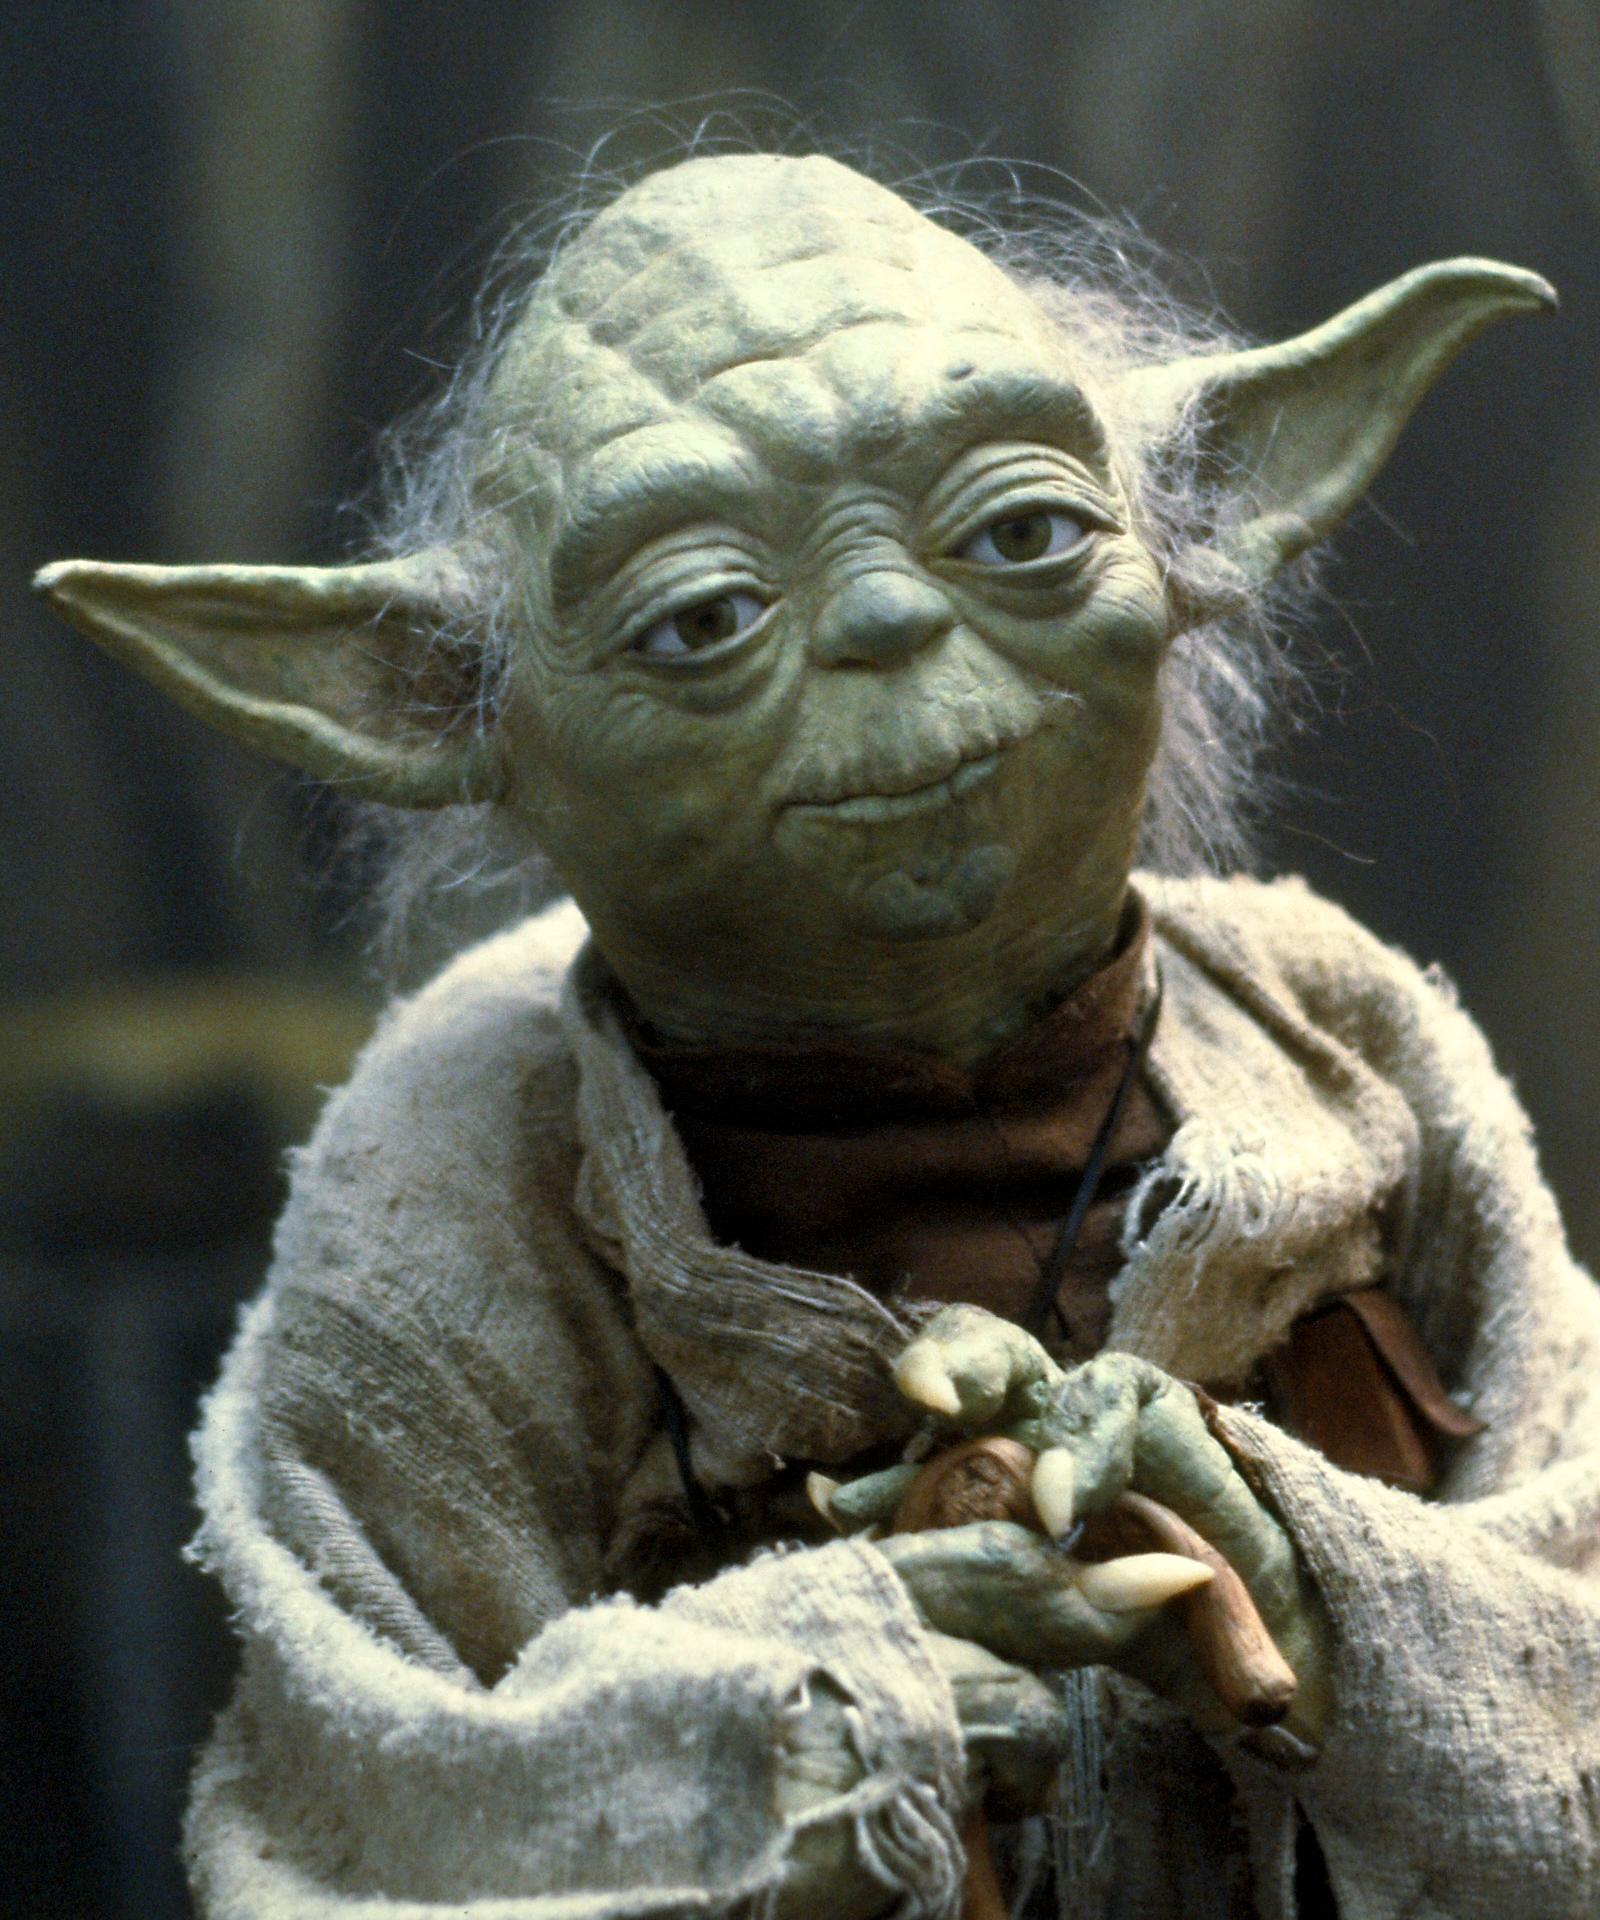 http://vignette2.wikia.nocookie.net/starwars/images/d/d6/Yoda_SWSB.png